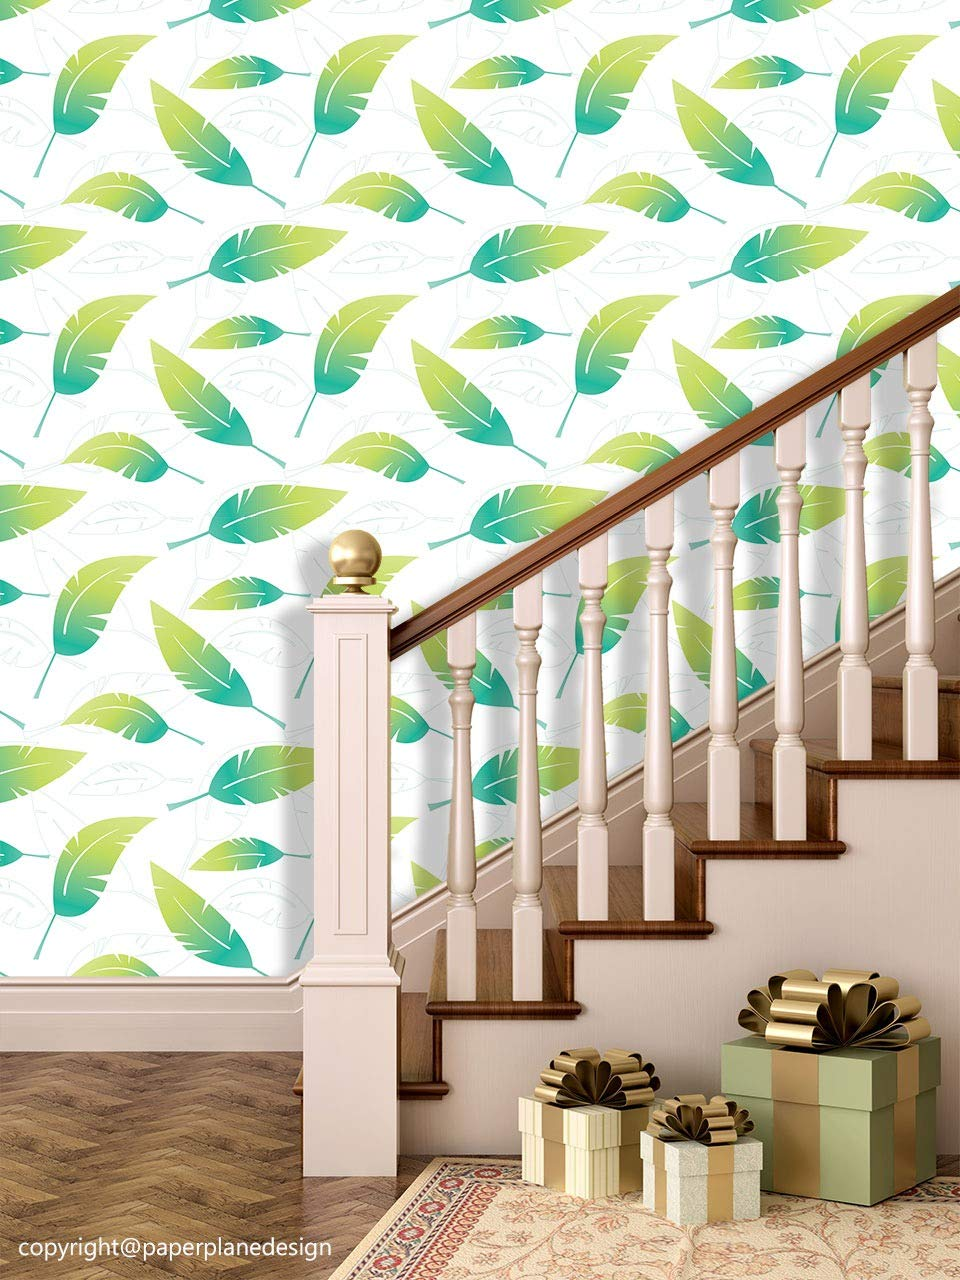 Paper Plane Design Wallpapers Best For Home Decor Wallpaper